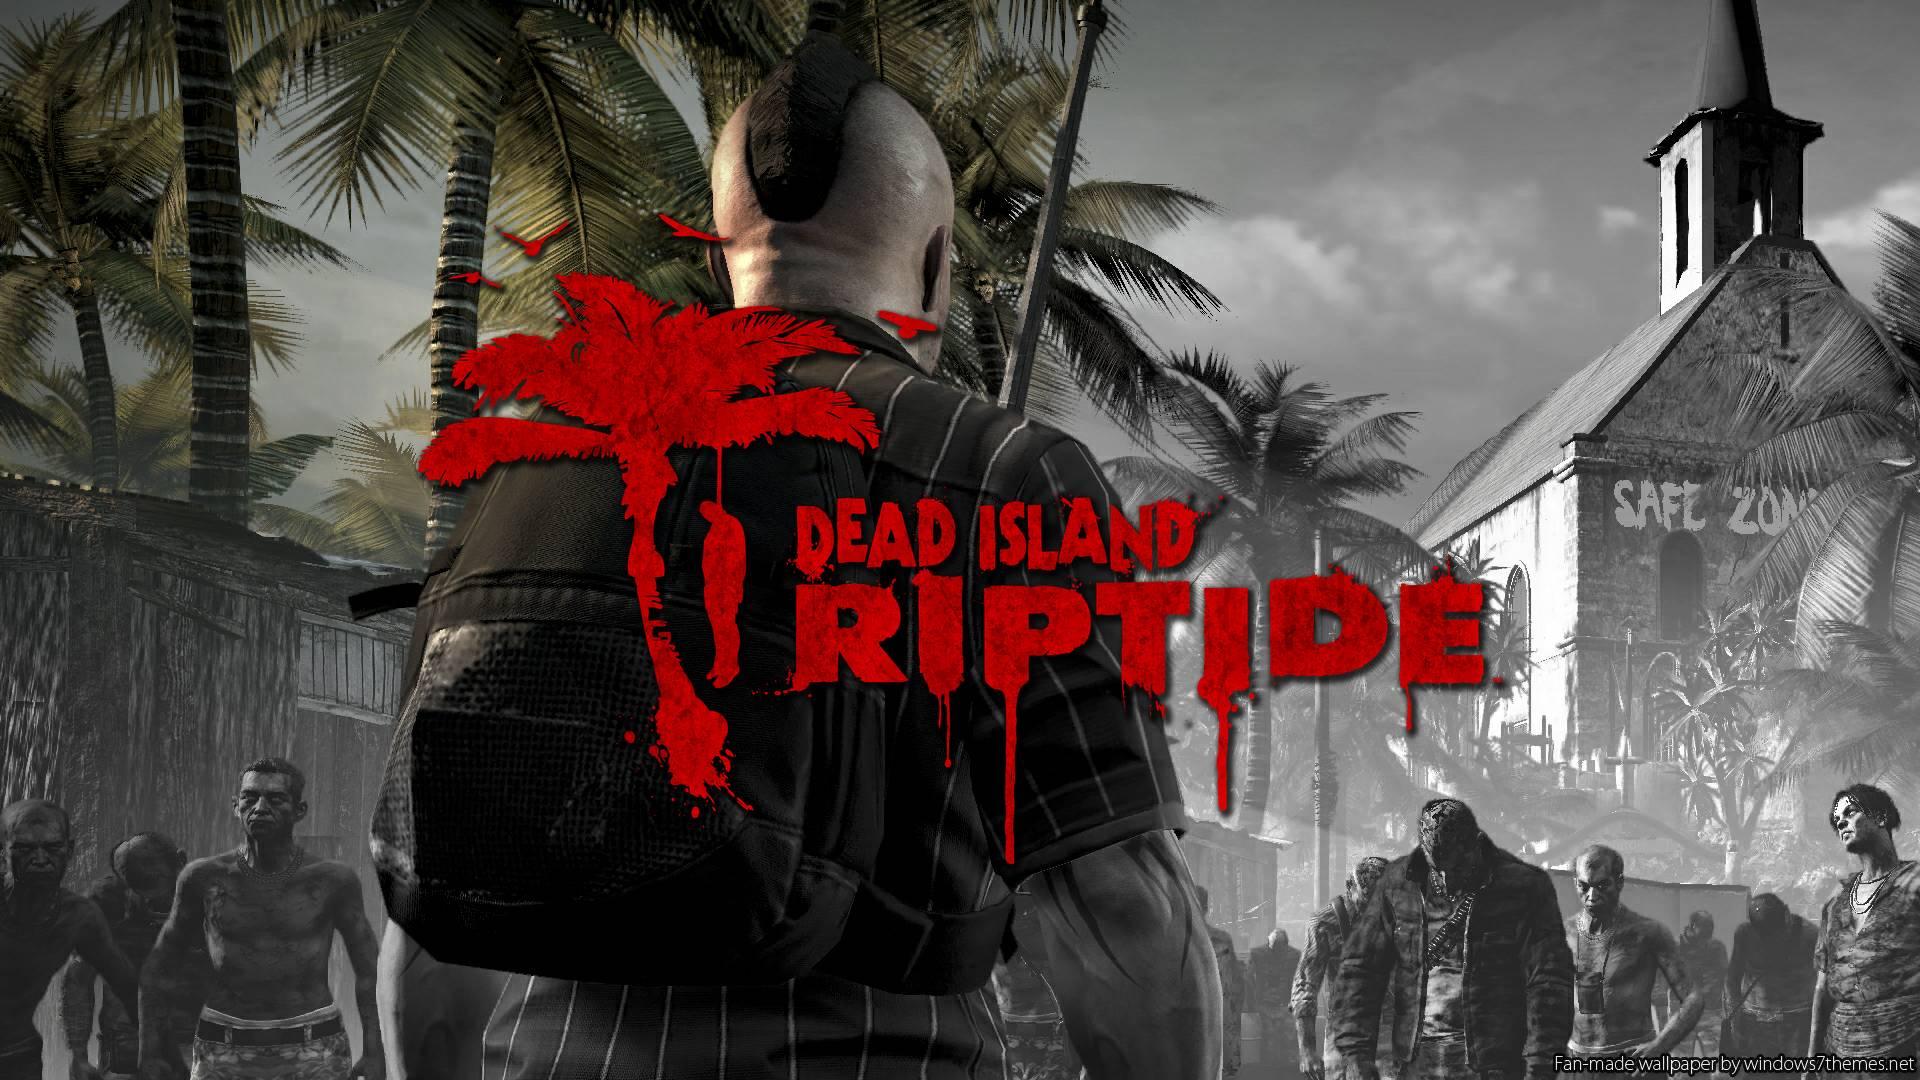 Dead Island Publisher